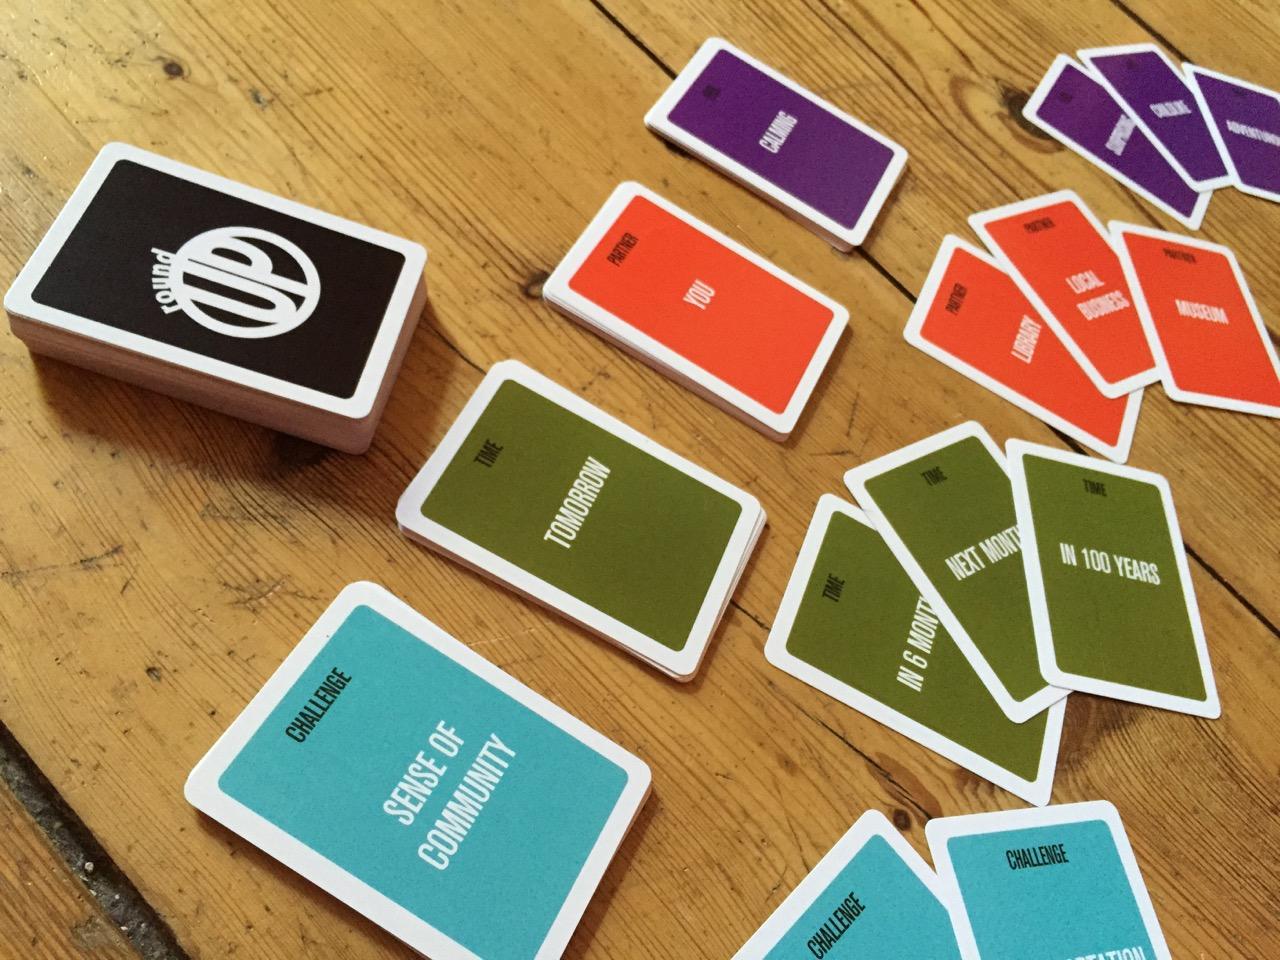 roundup_card_deck.jpg